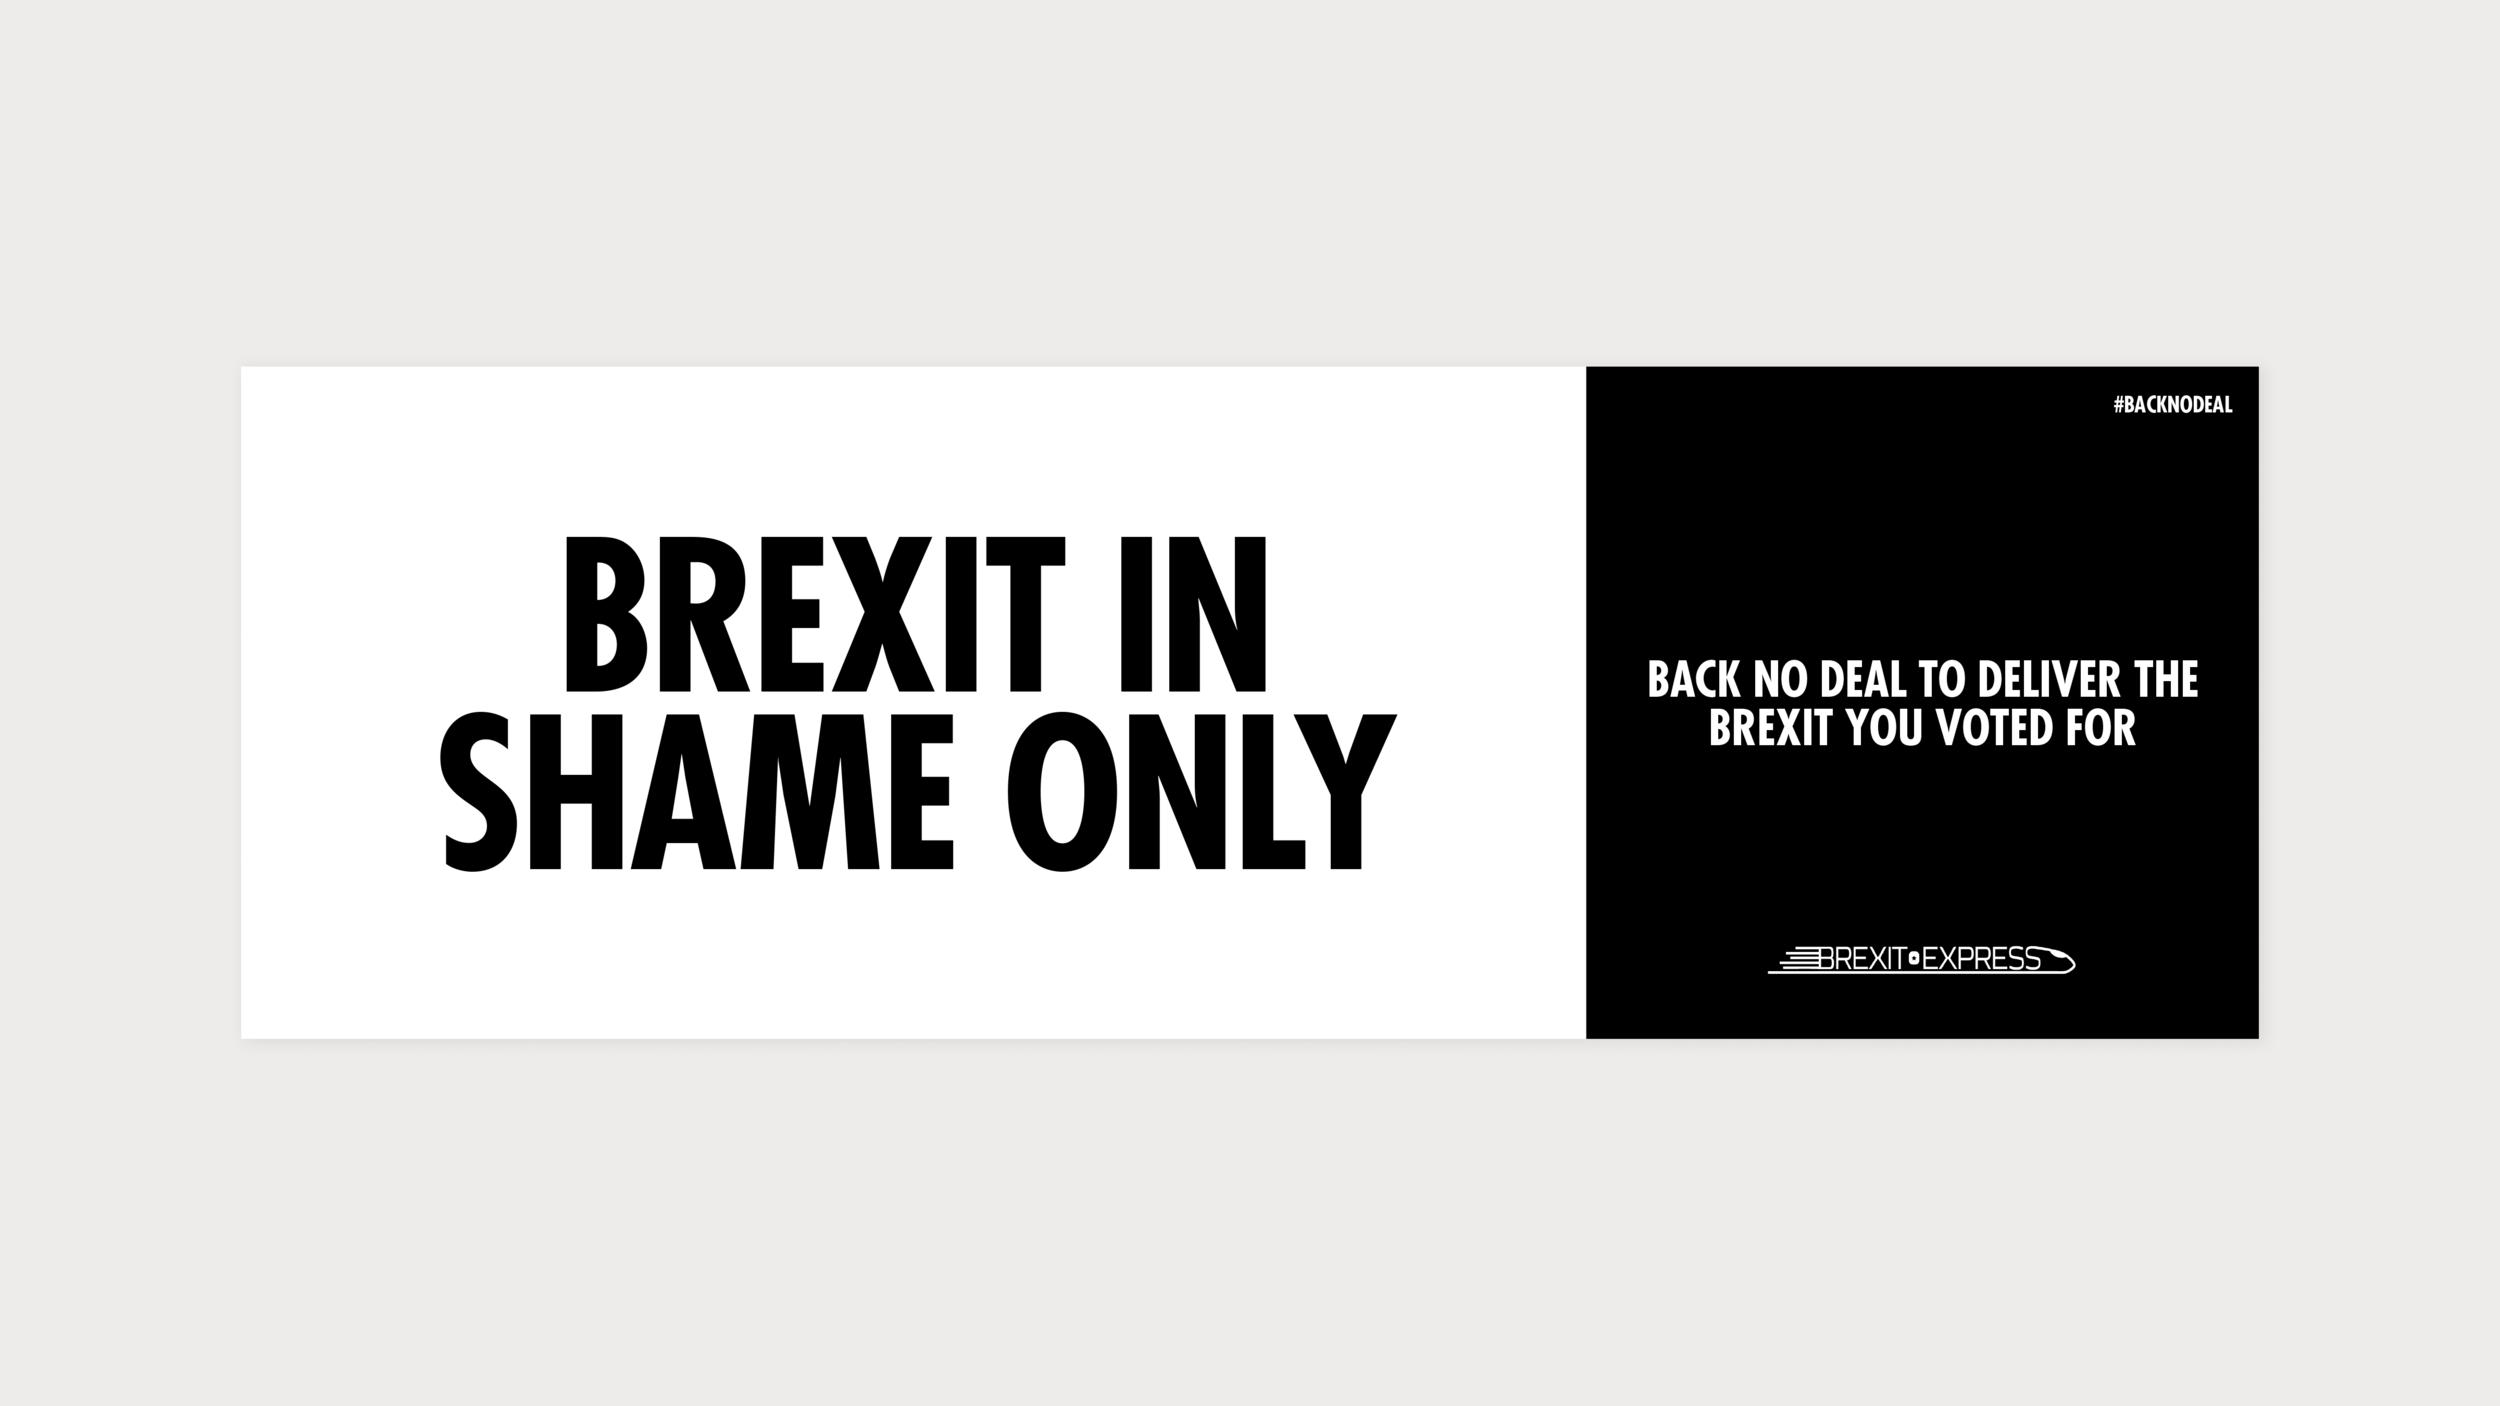 BrexitExpress_96Sheet_Brexitinshameonly.png